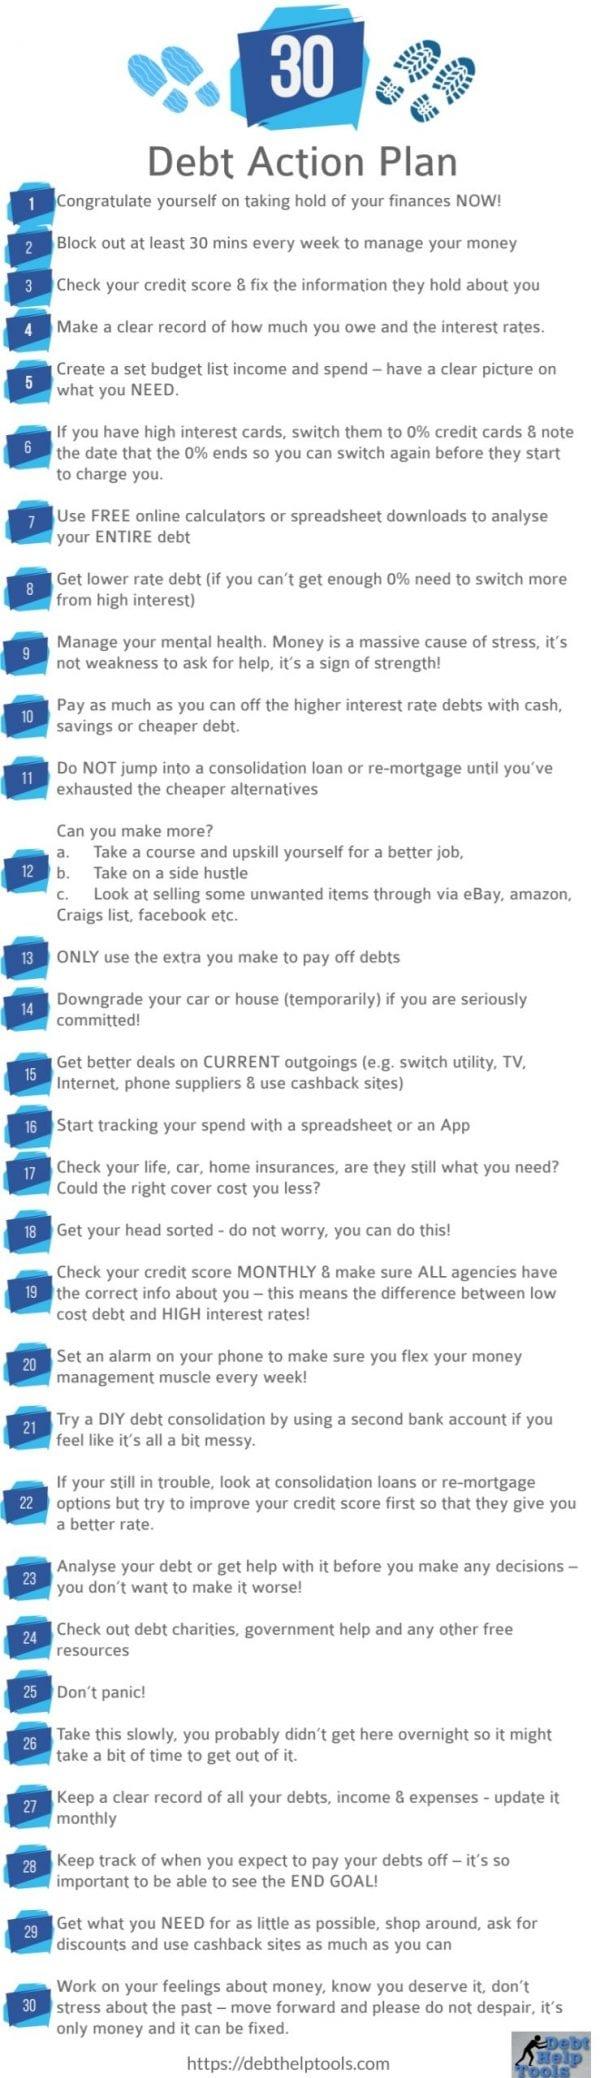 debt action plan